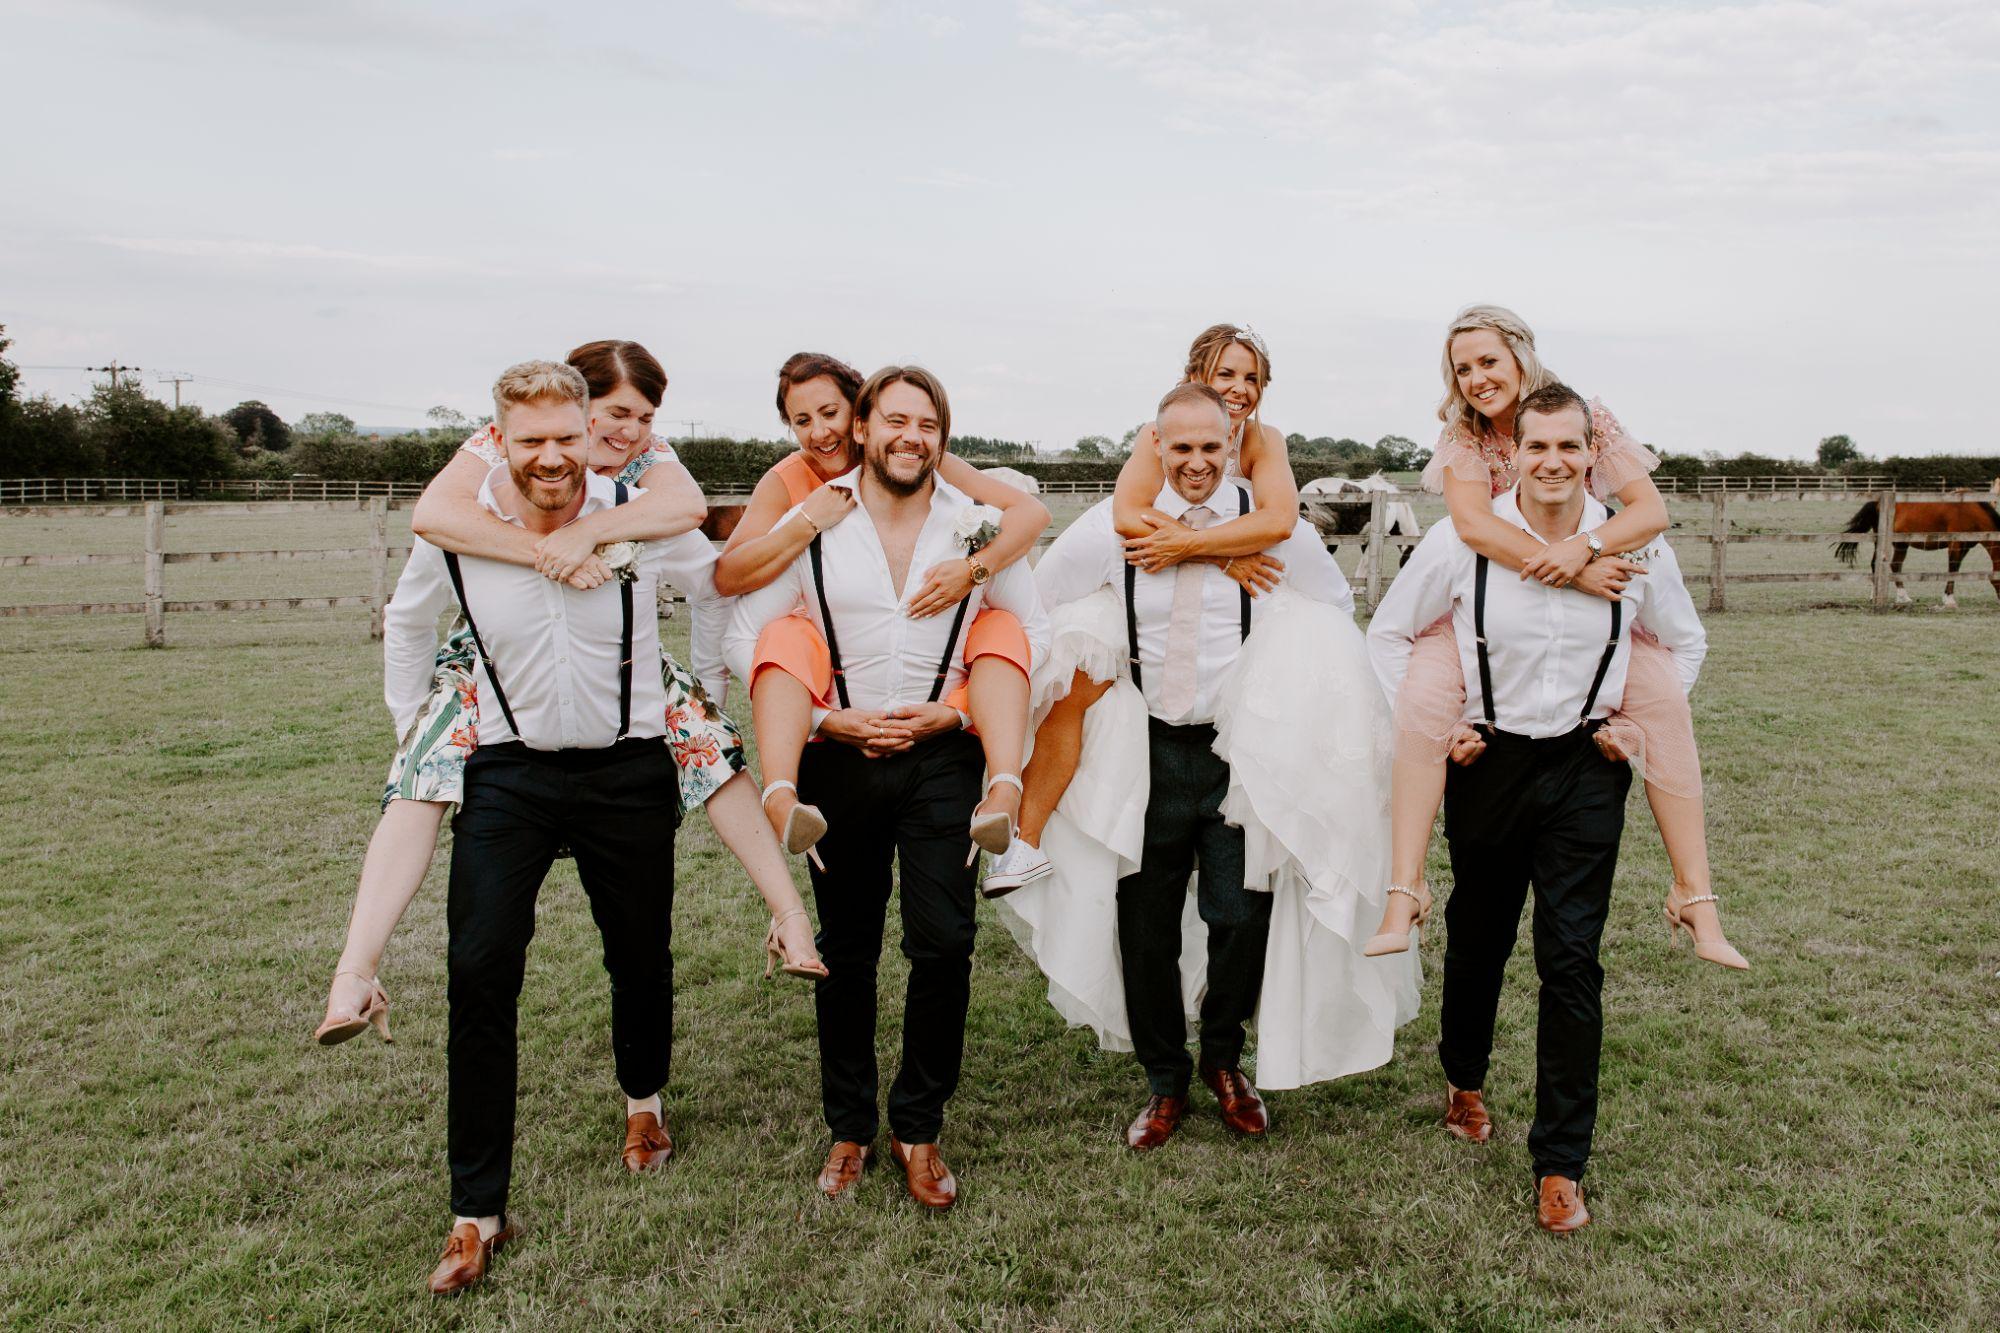 Wedding_Photography_Becky_Tranter-11